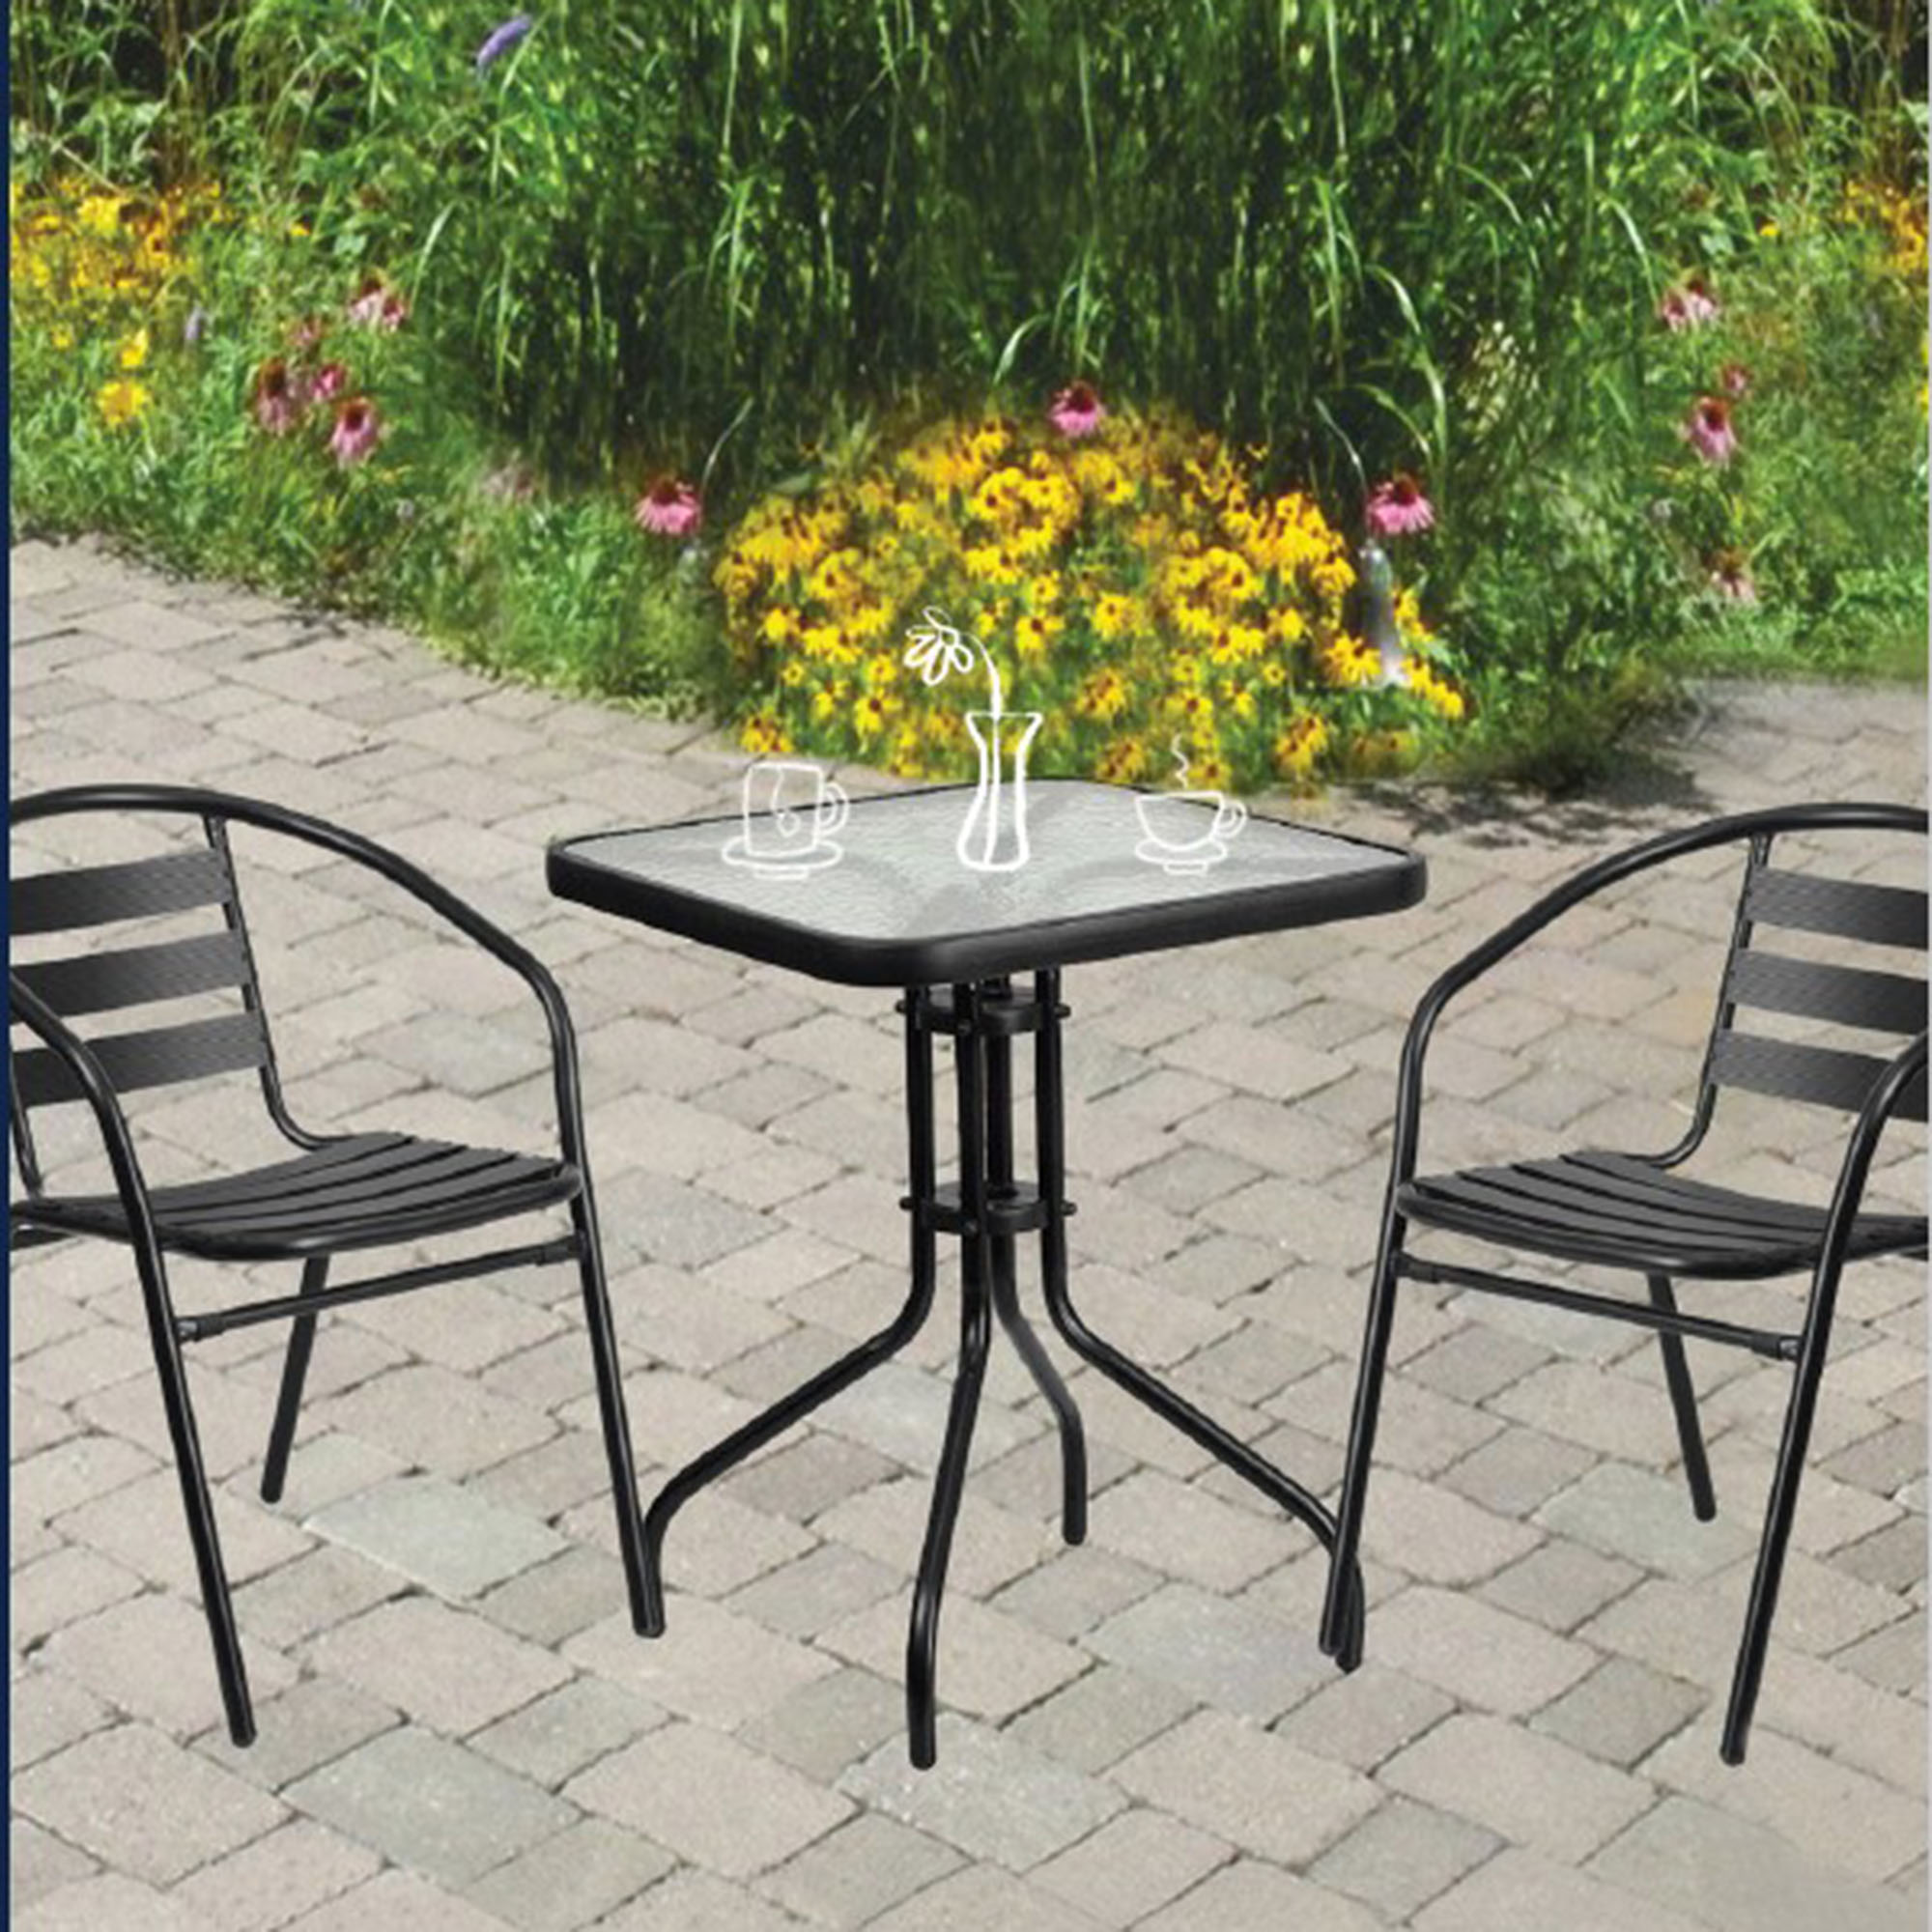 richdale 3 piece bistro patio set